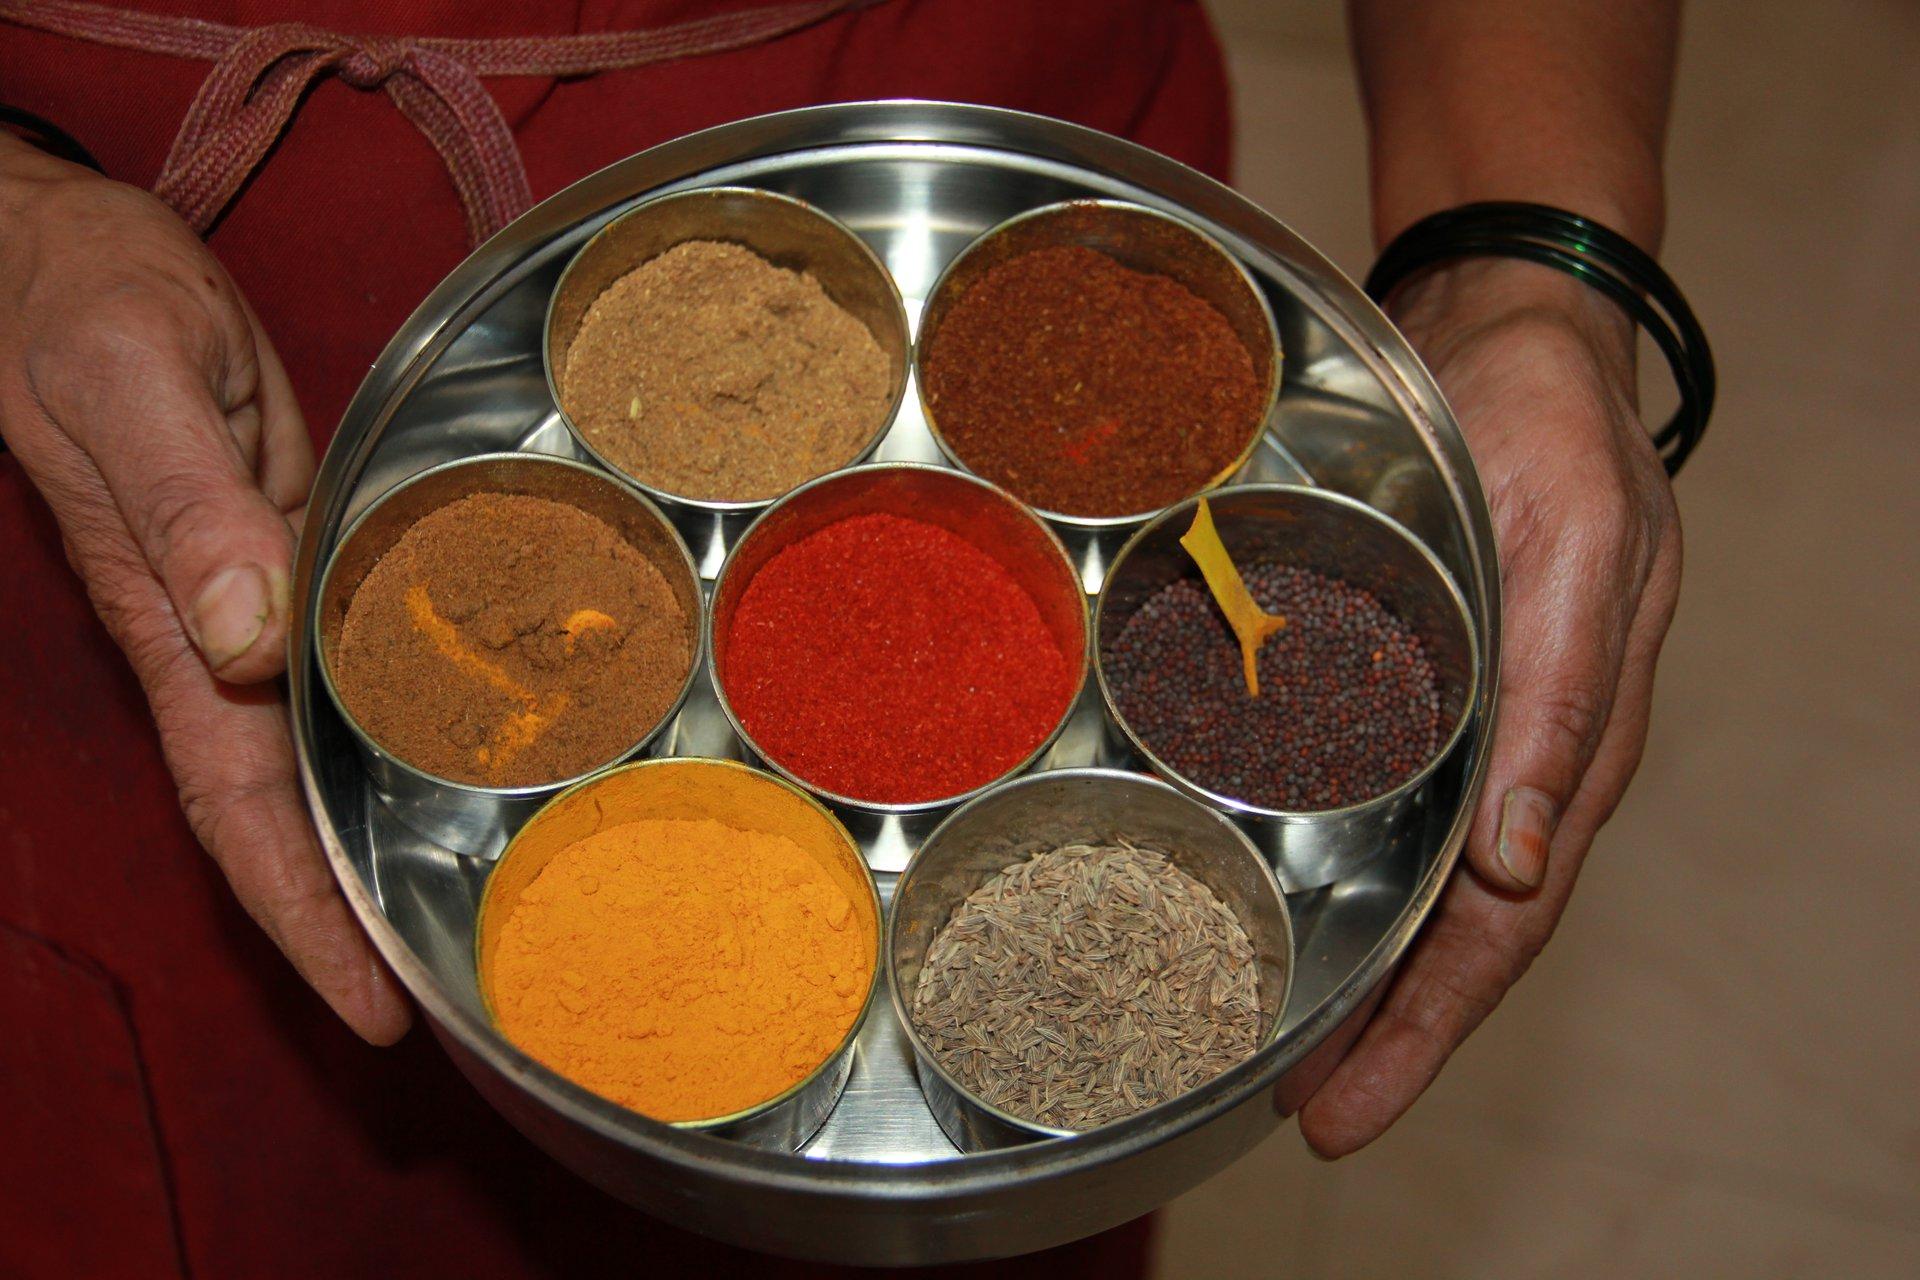 Sangam spices